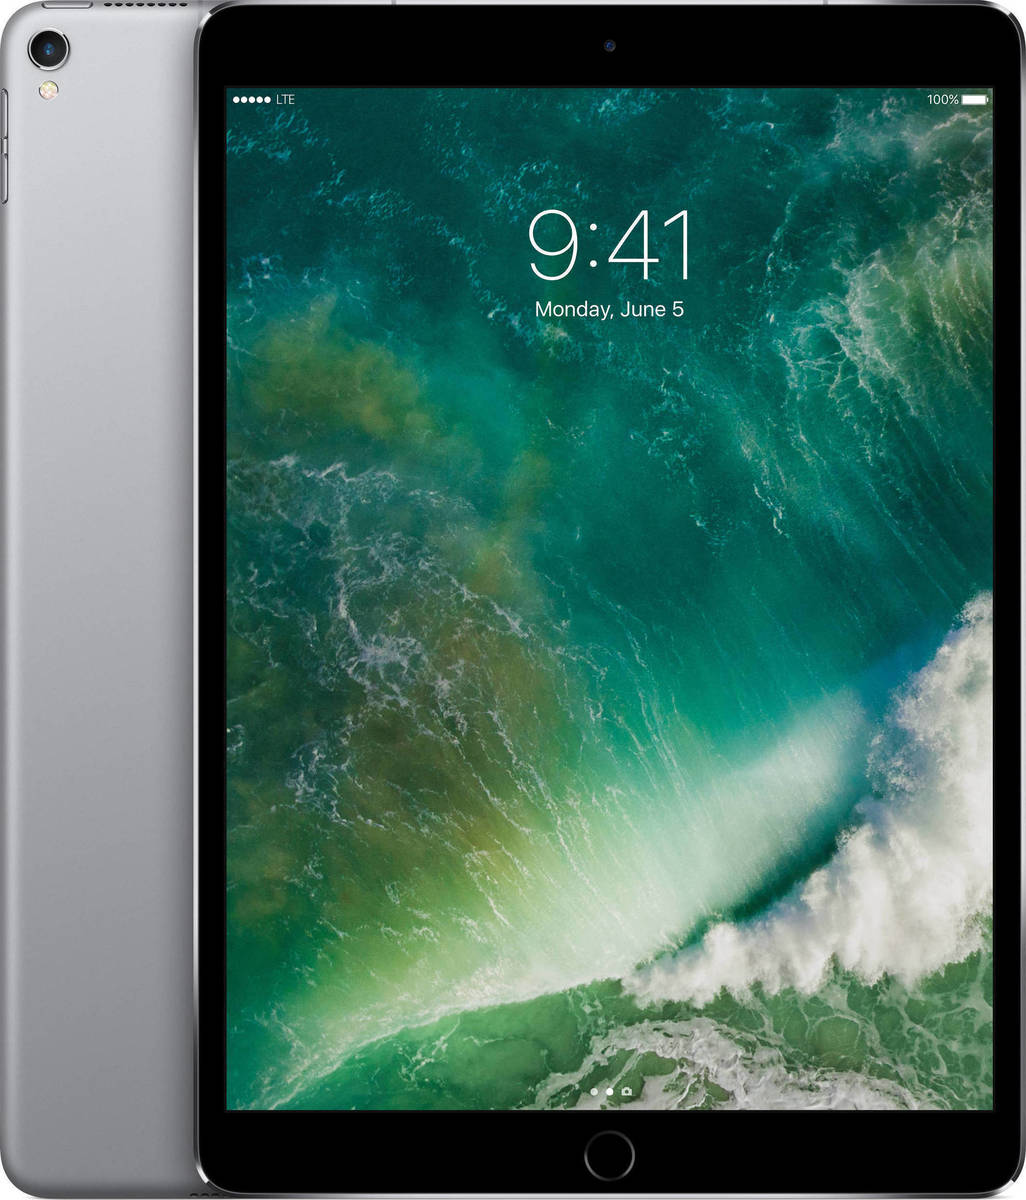 Apple iPad Pro 10.5'' 2017 WiFi and Cellular 256GB Space Grey Με Αντάπτορα Πληρωμή έως 24 δόσεις